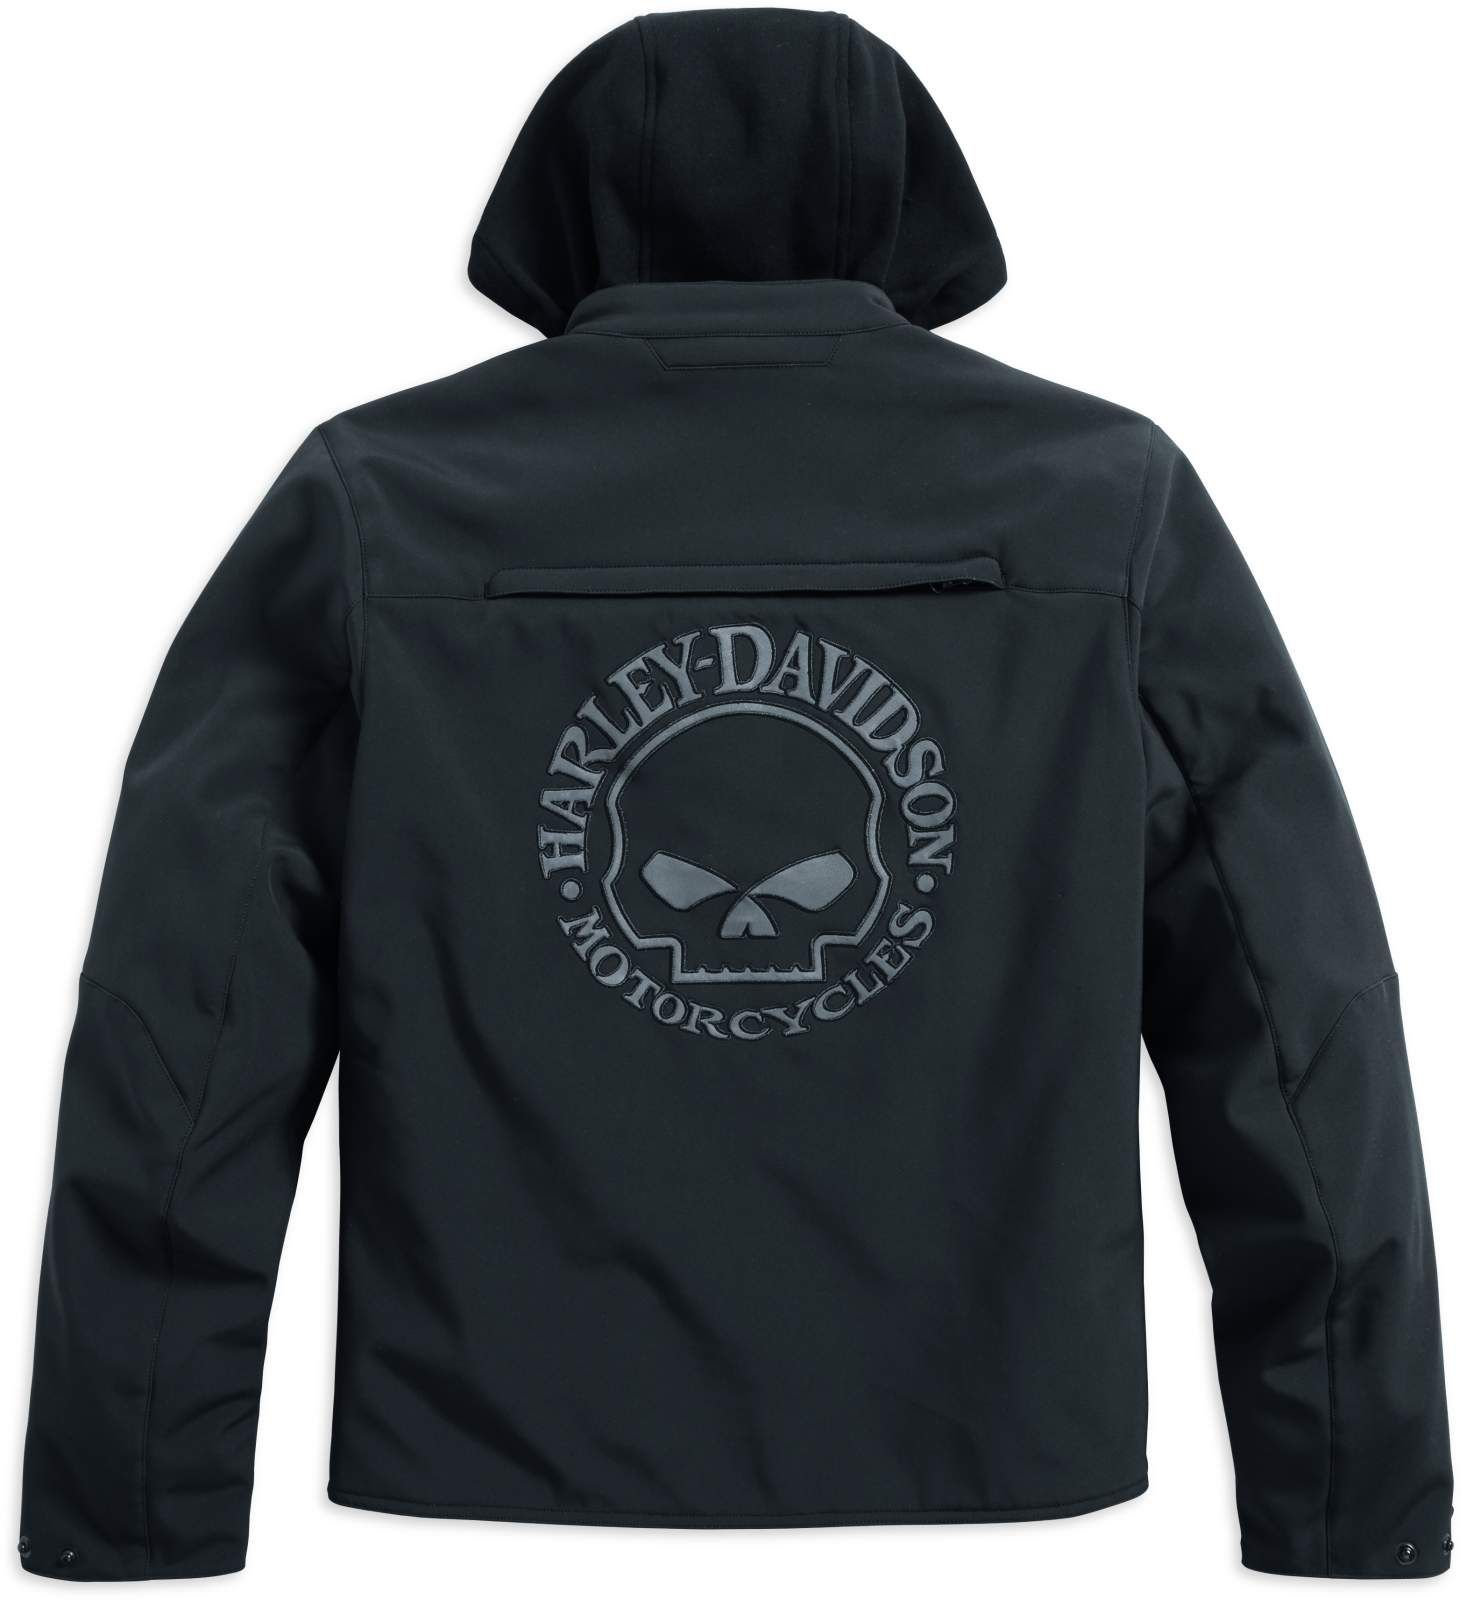 Harley Davidson Jacke Mit Kapuze